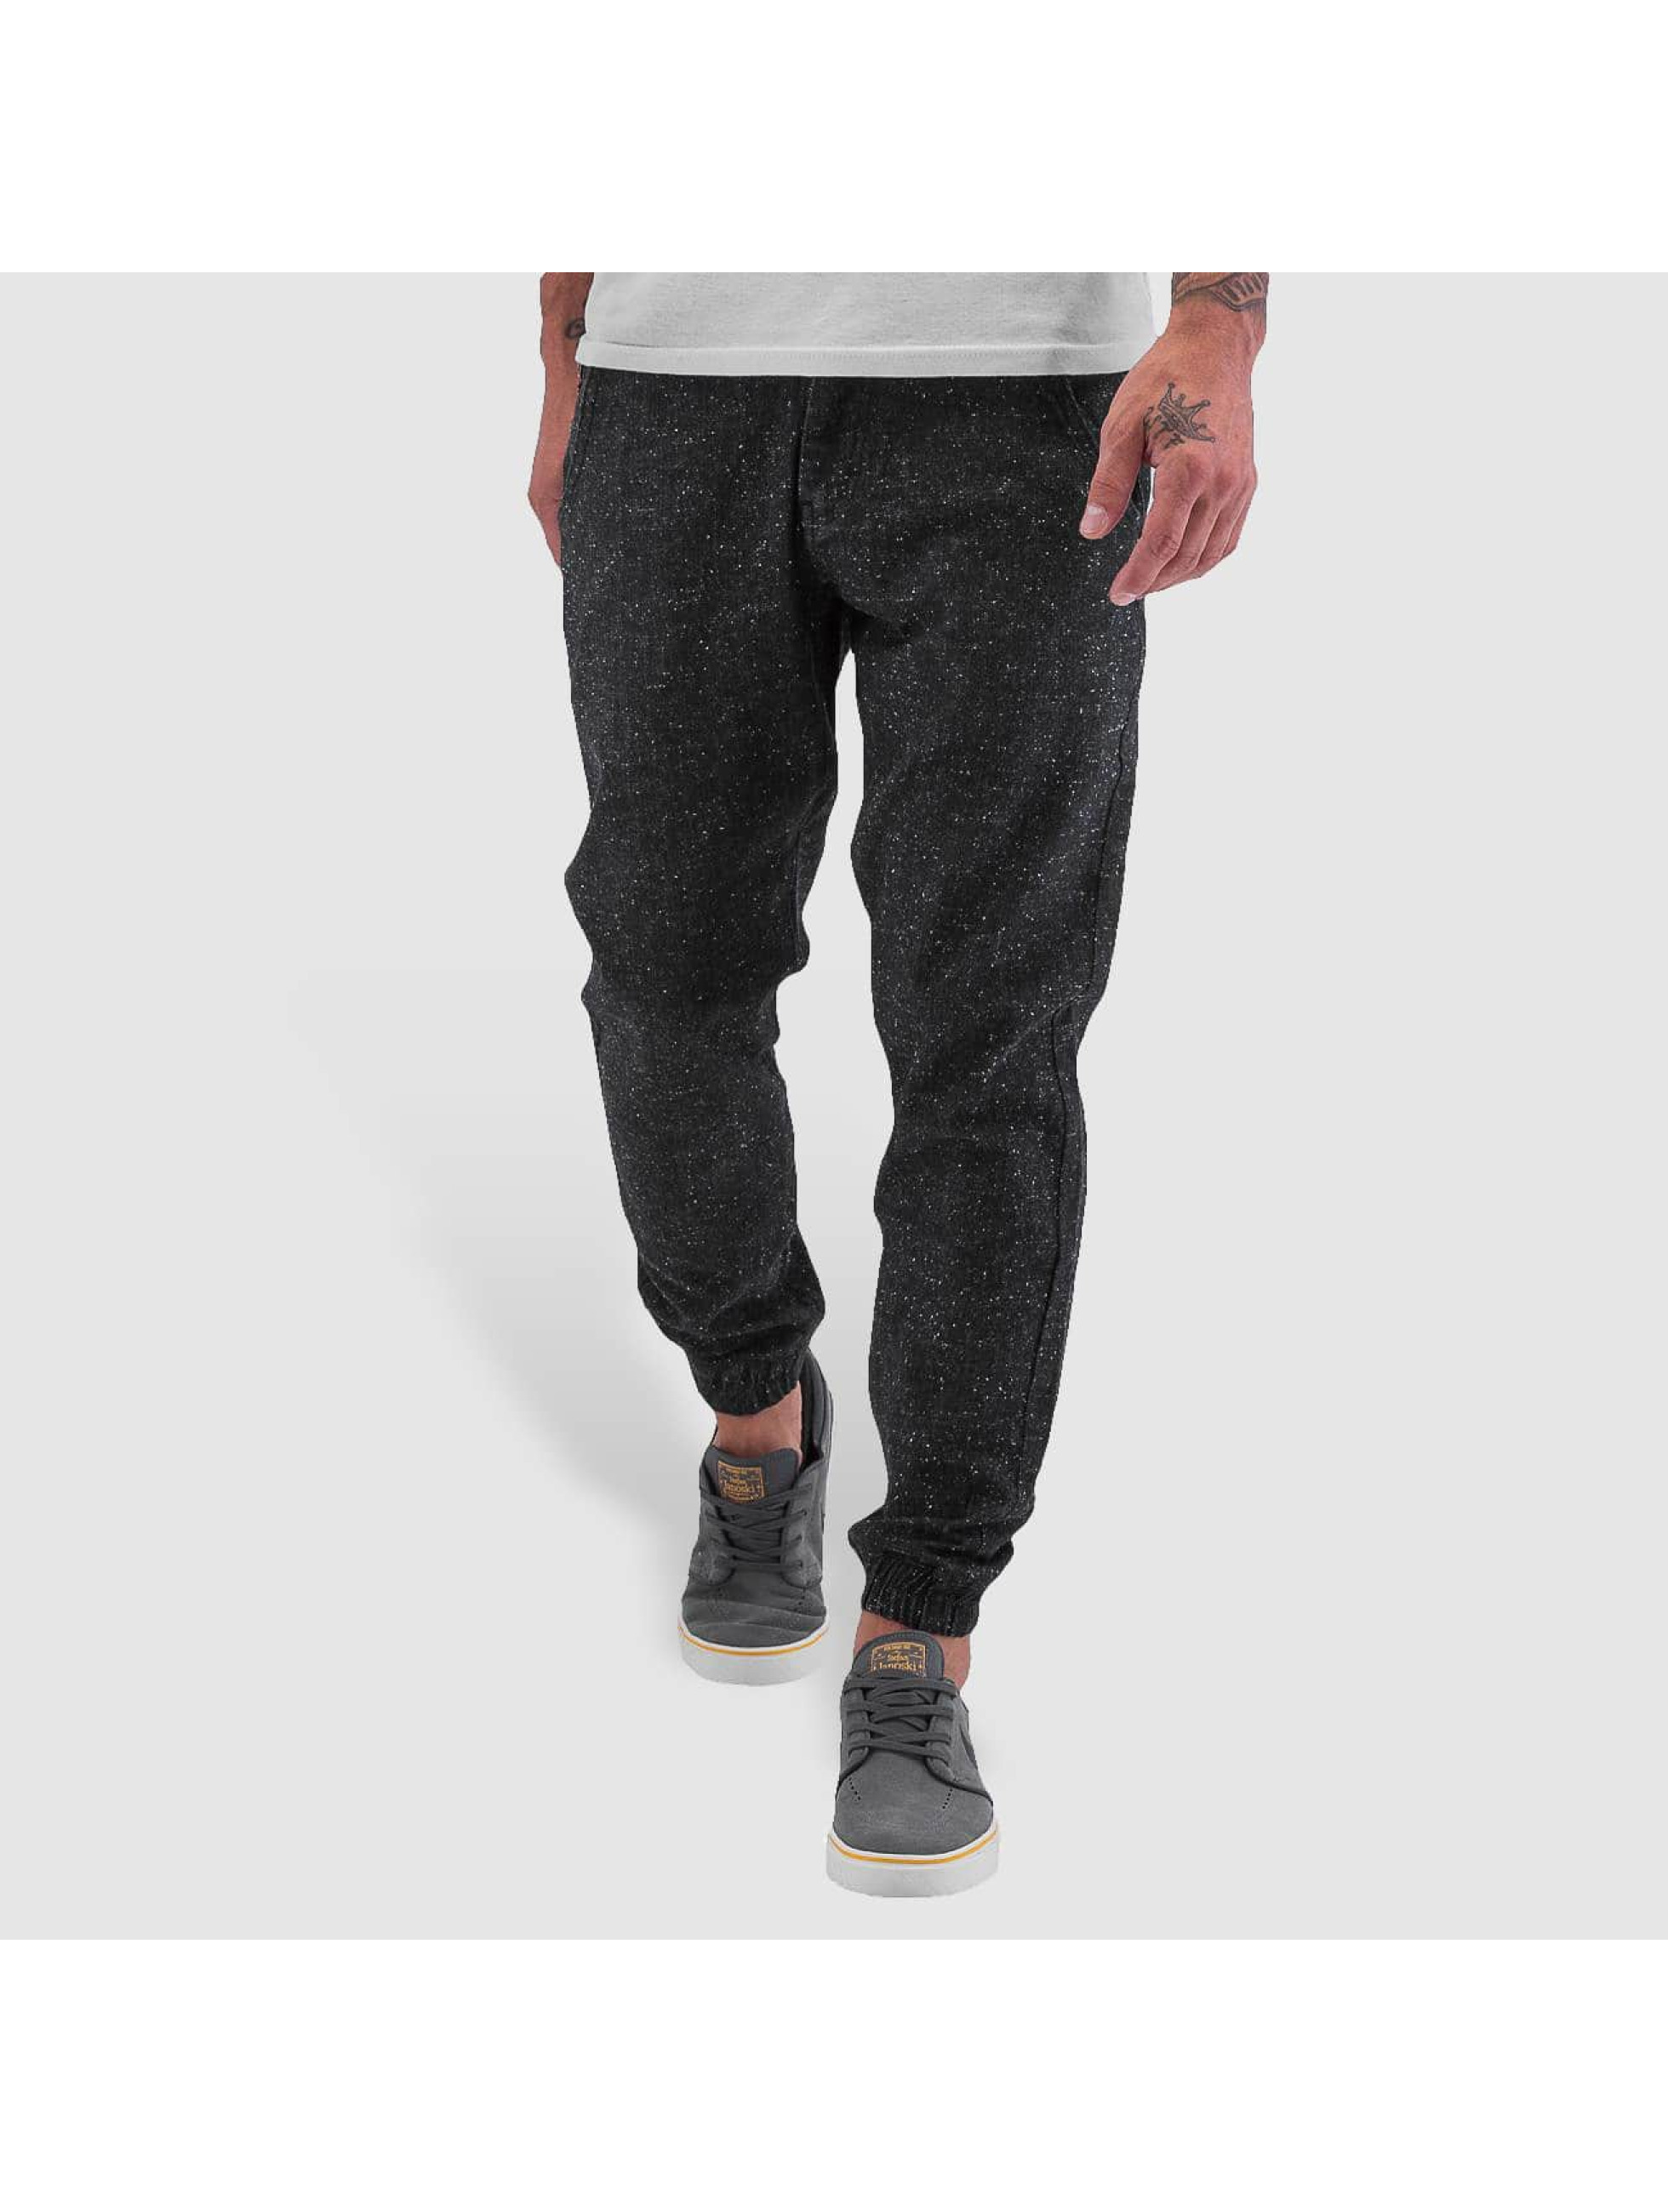 Rocawear / Chino Roc in black W 28